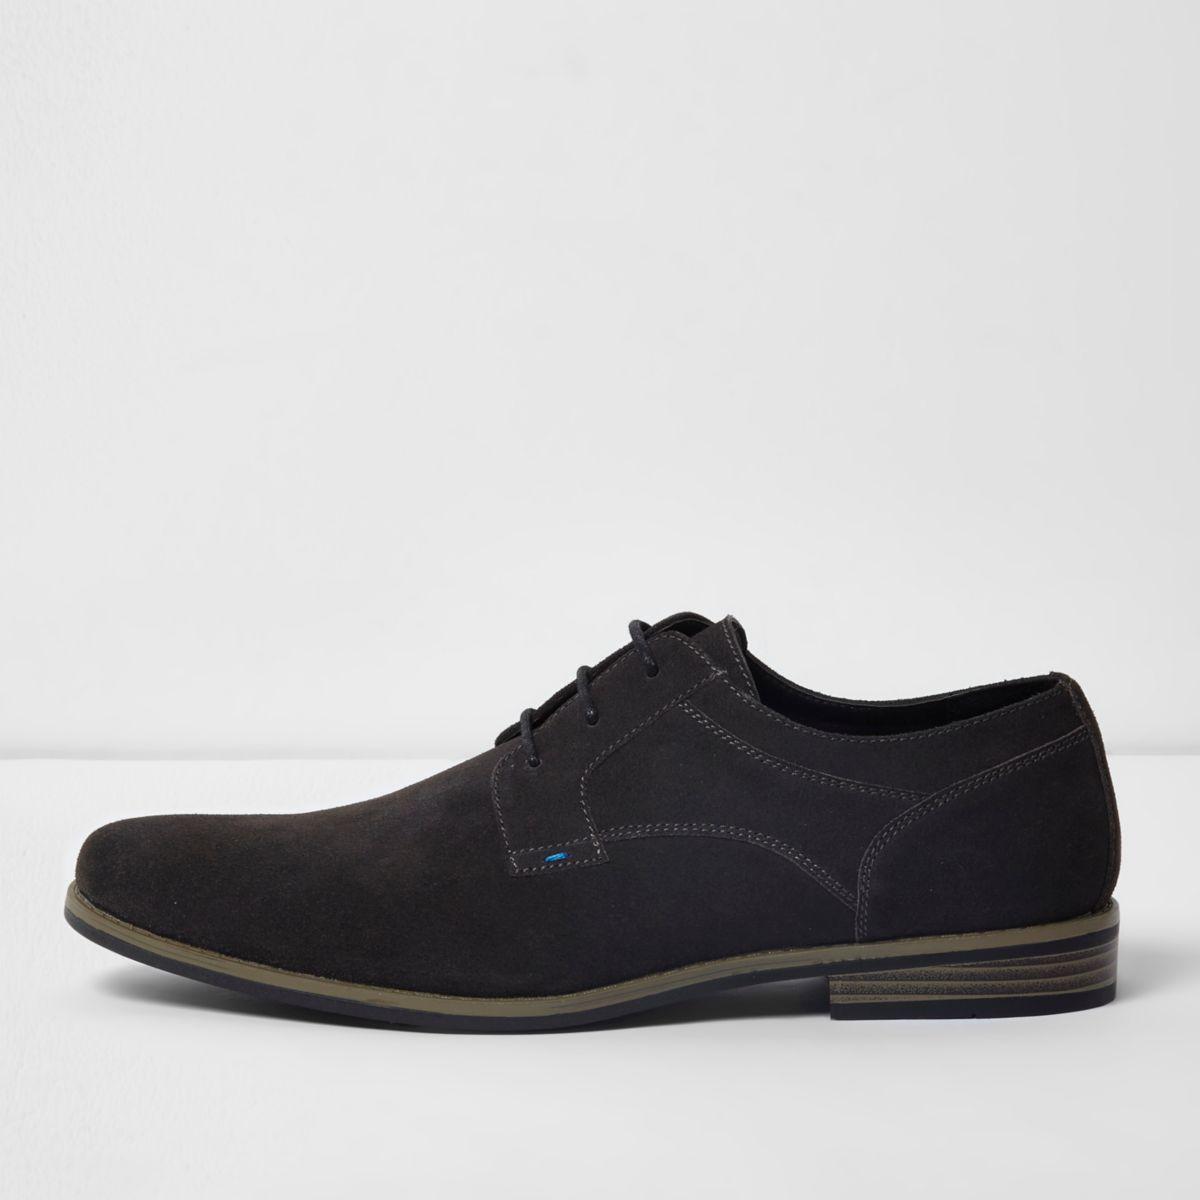 River Island Mens Espadrille 1600195300 Men's Shoes River Island Shoes